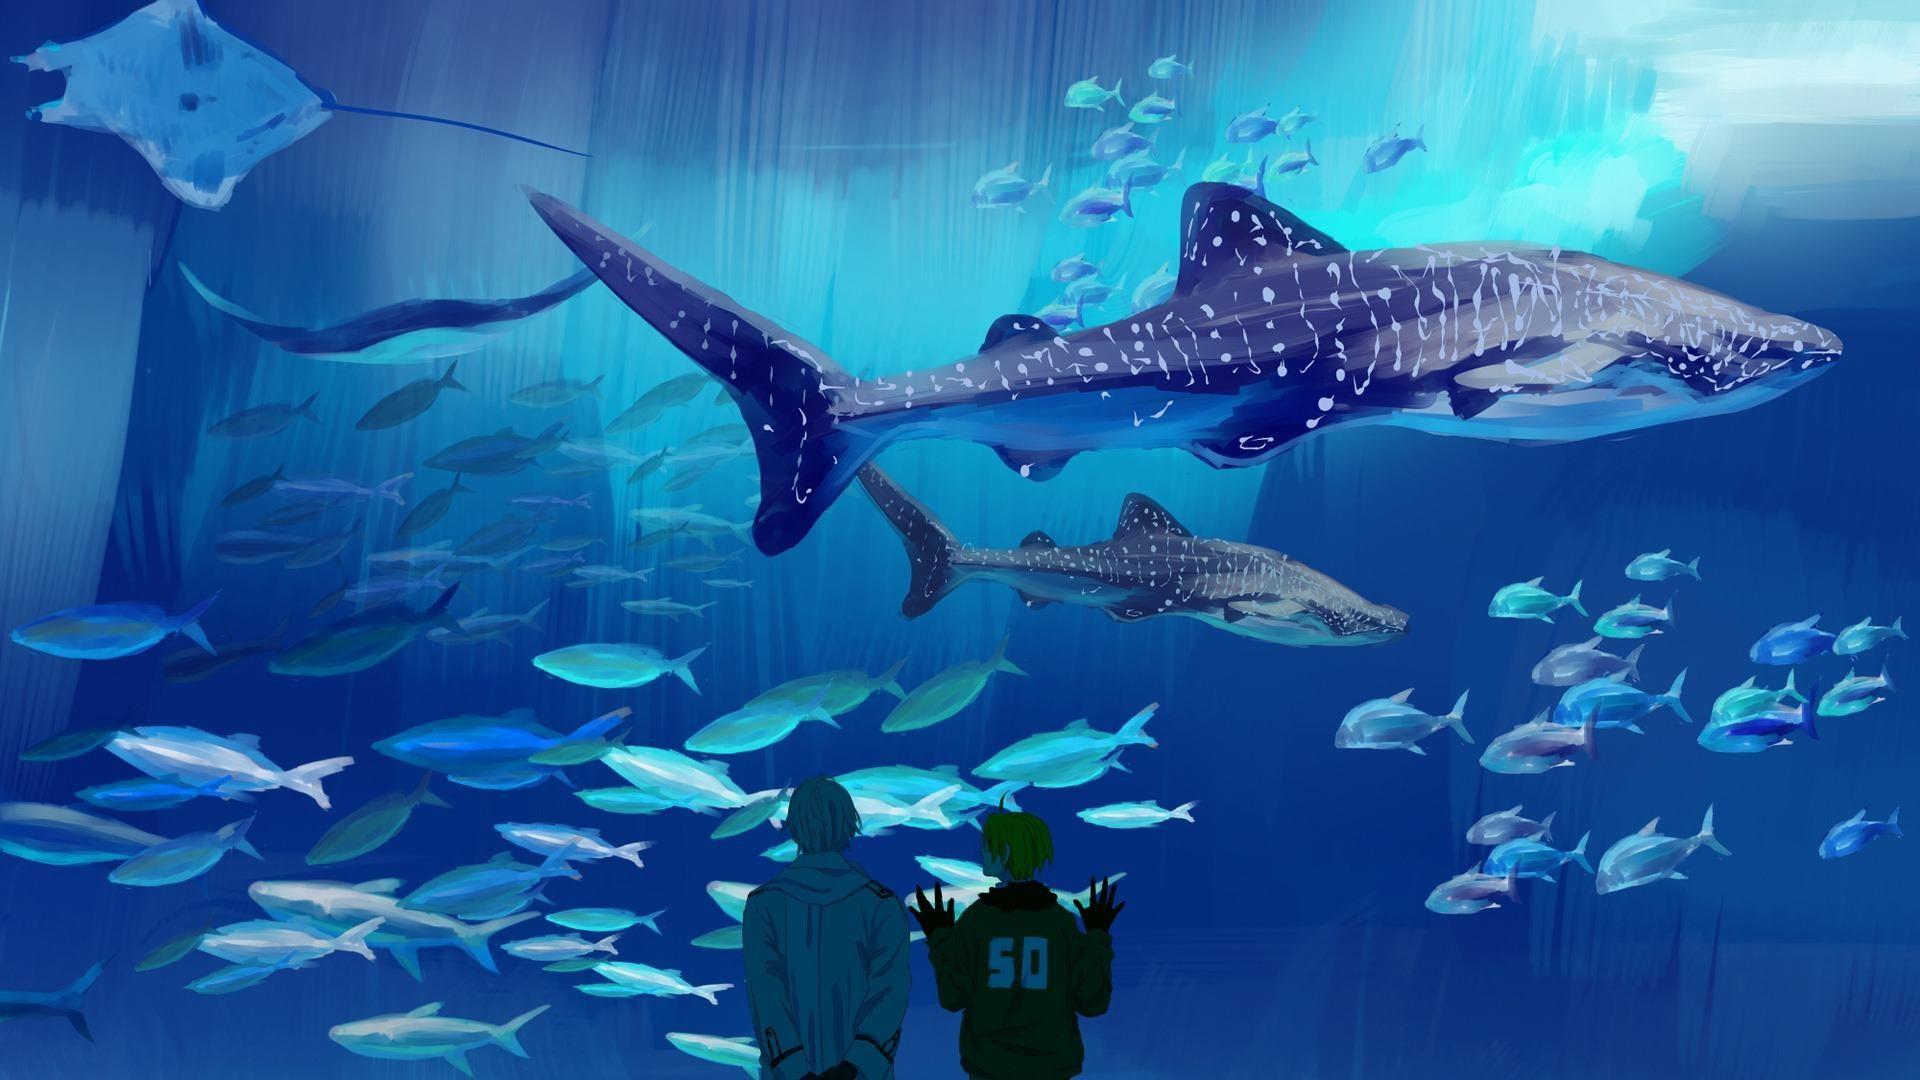 Saltwater Fish Wallpaper (58+ Images